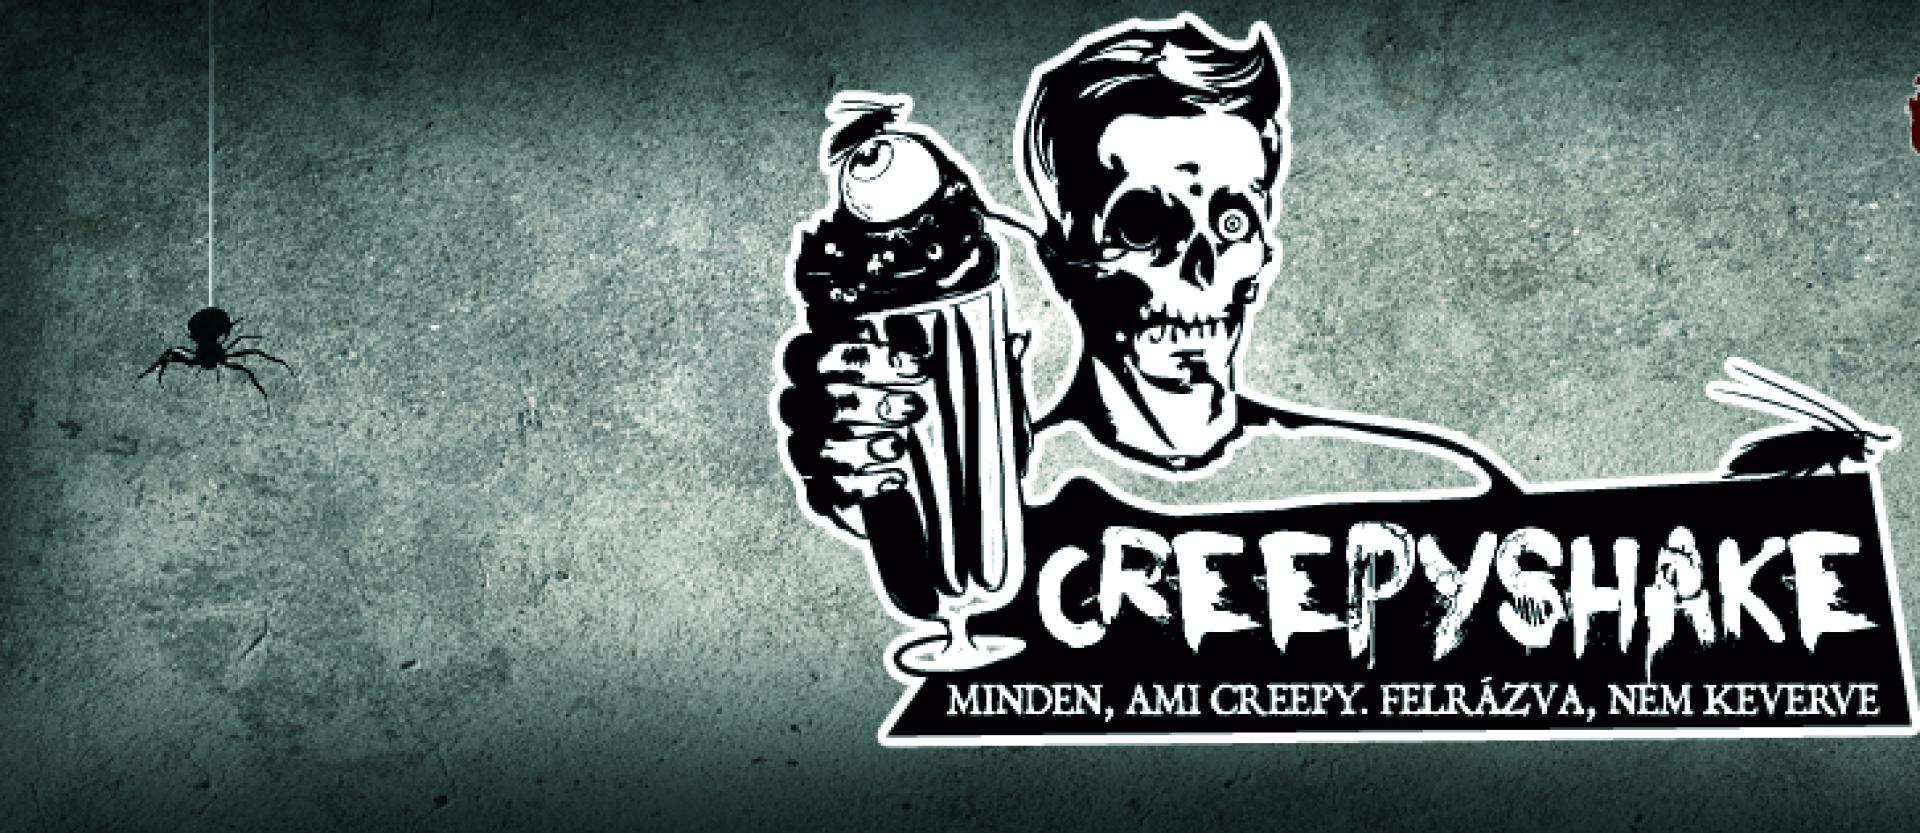 Creepy kedvencek 2017. november